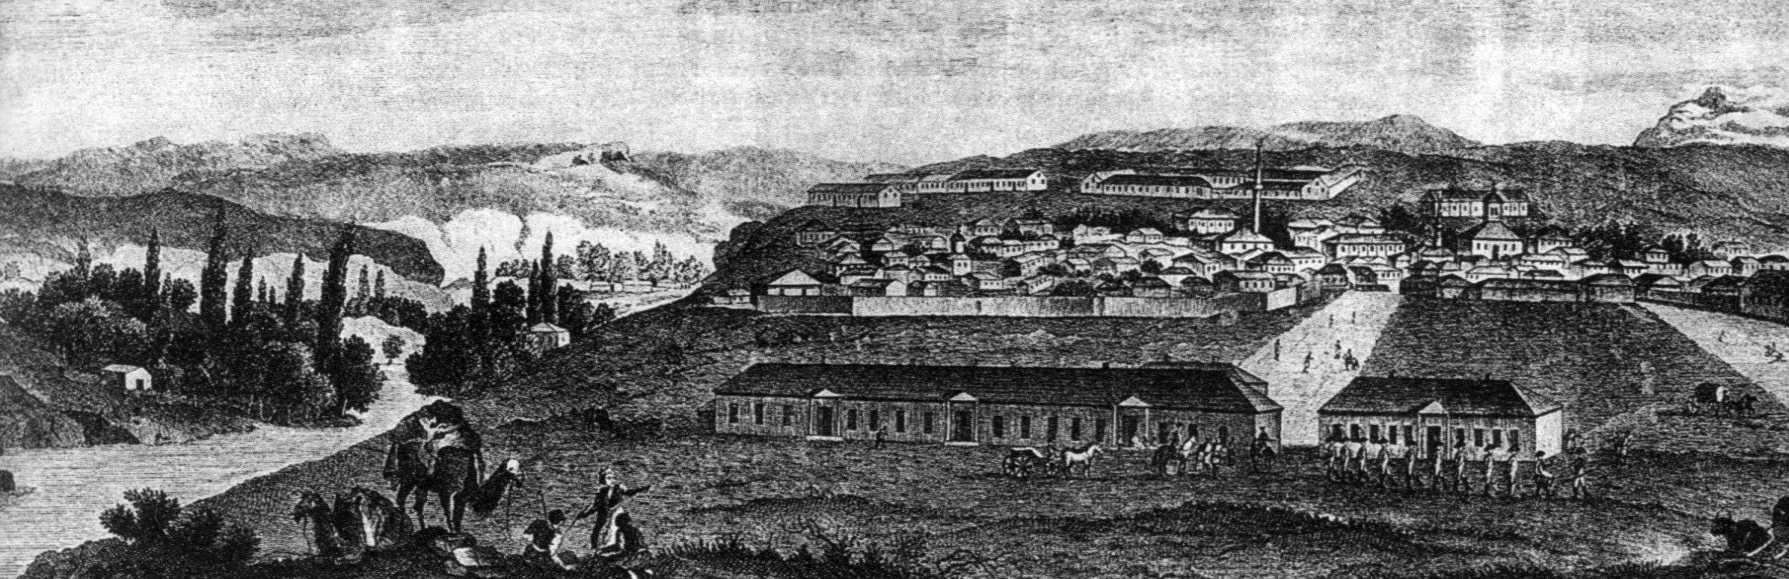 1803 р. Панорама Ак-Мечеті